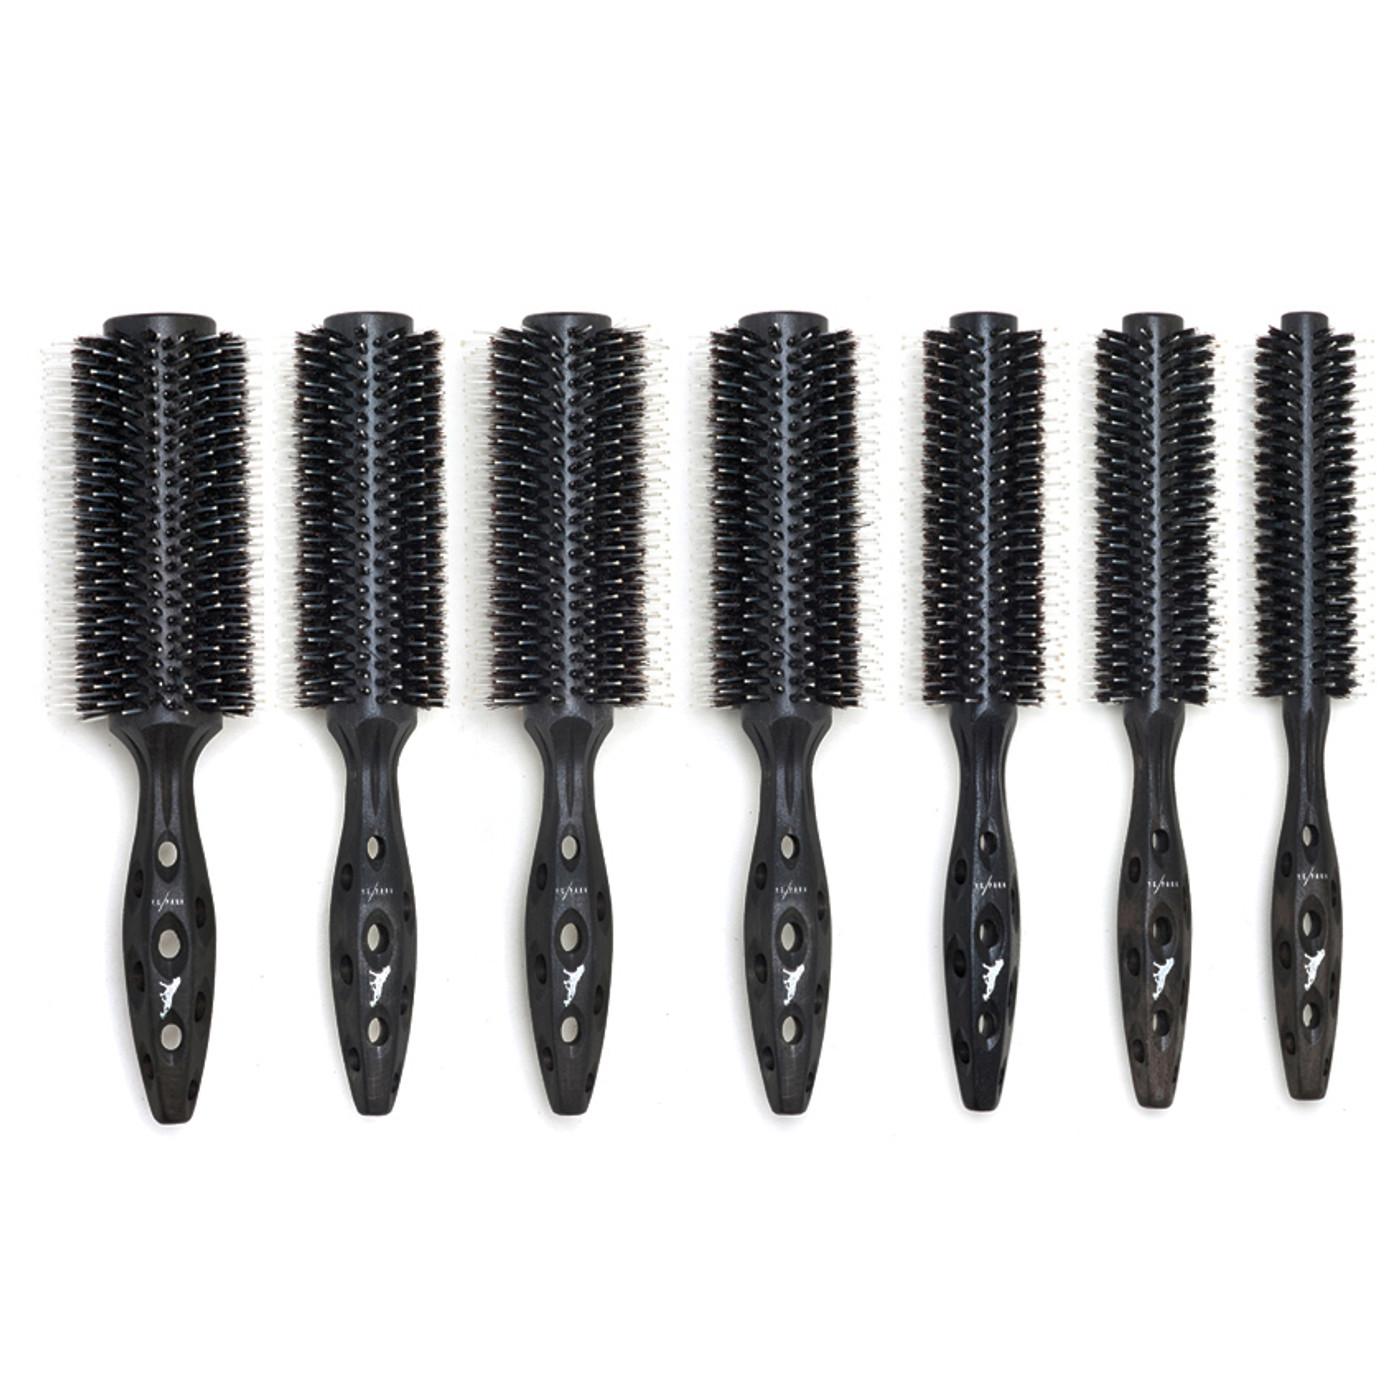 YS Park Carbon Tiger Hairbrush Range